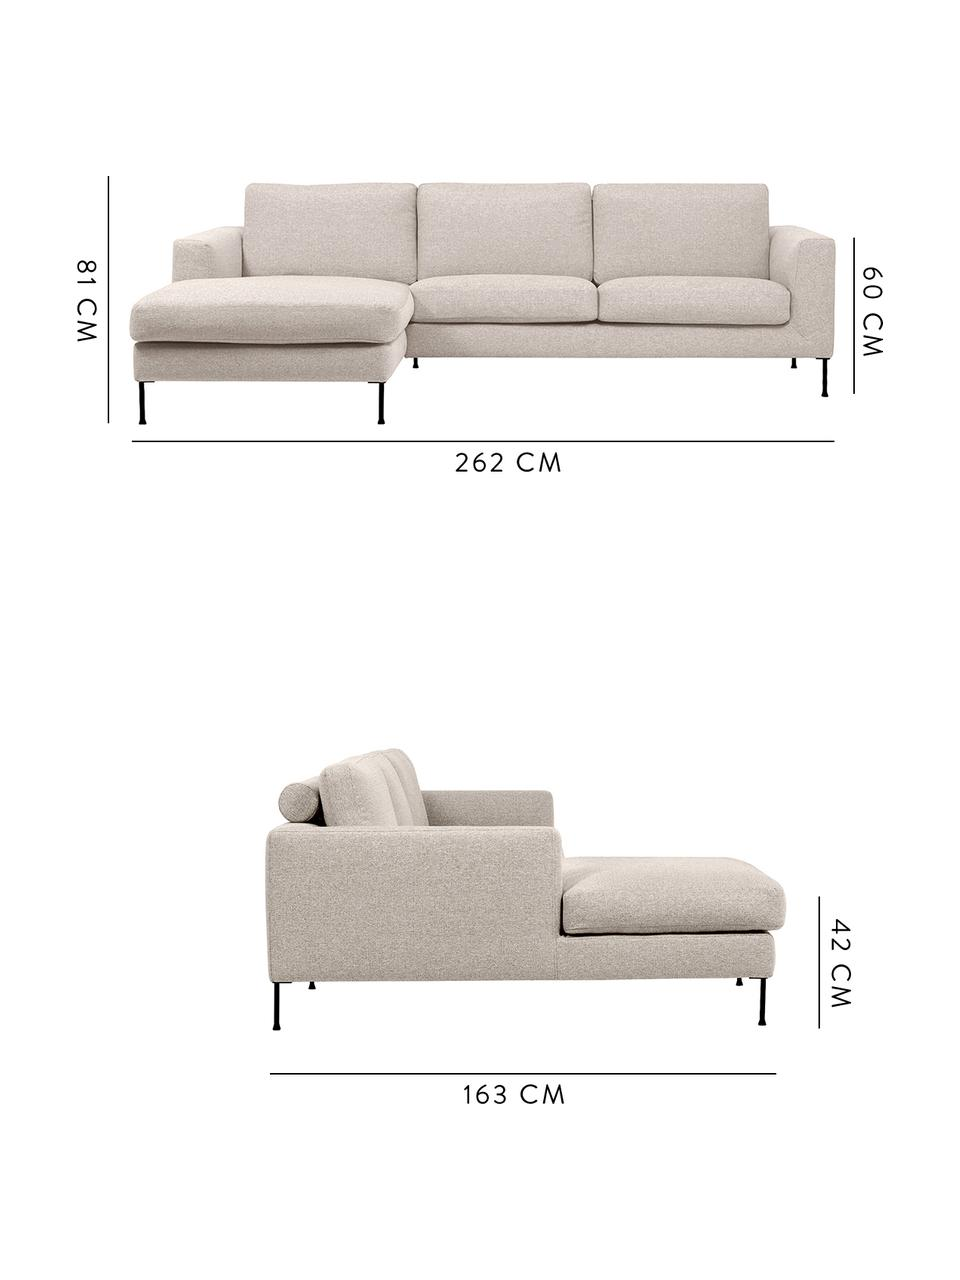 Canapé d'angle 3places Cucita, Tissu beige